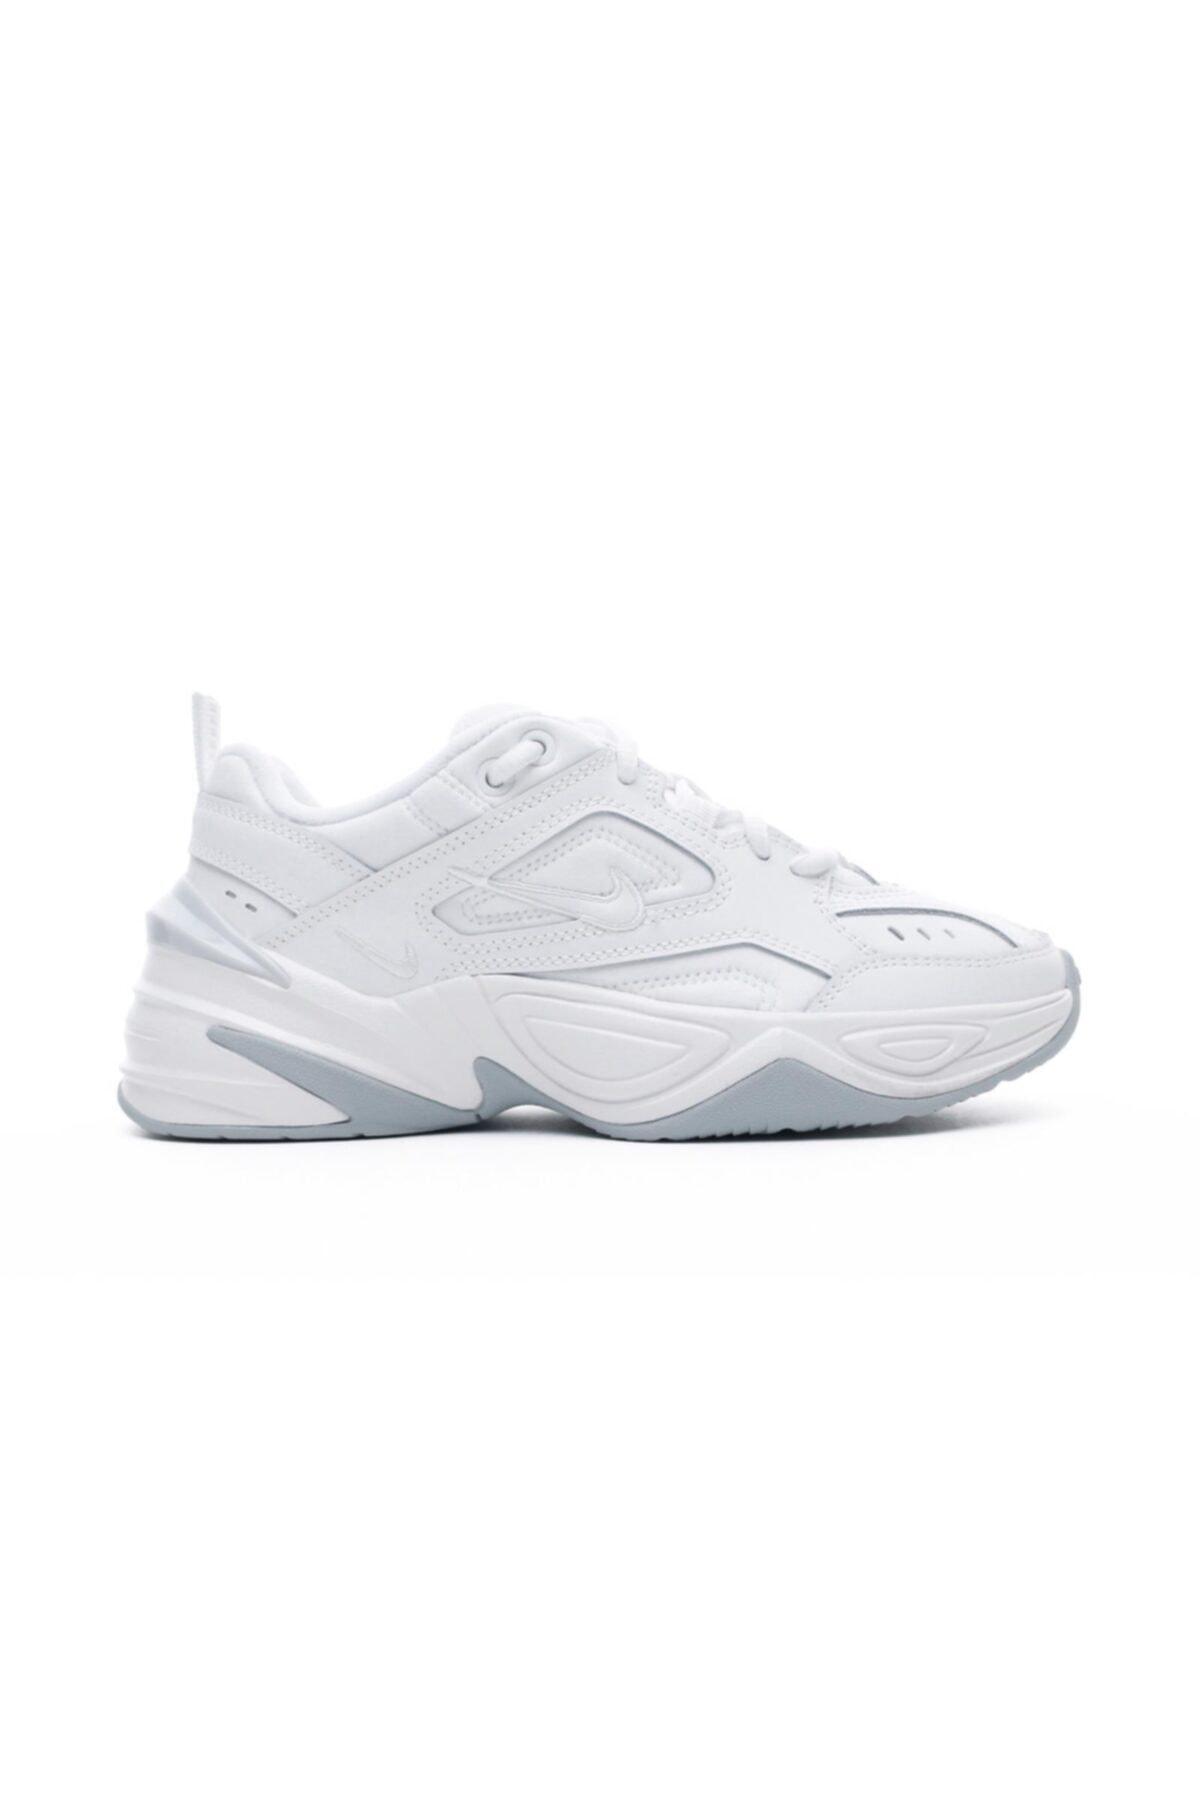 Nike M2k Tekno Sneaker Unisex Spor Ayakkabı Ao3108-100 1